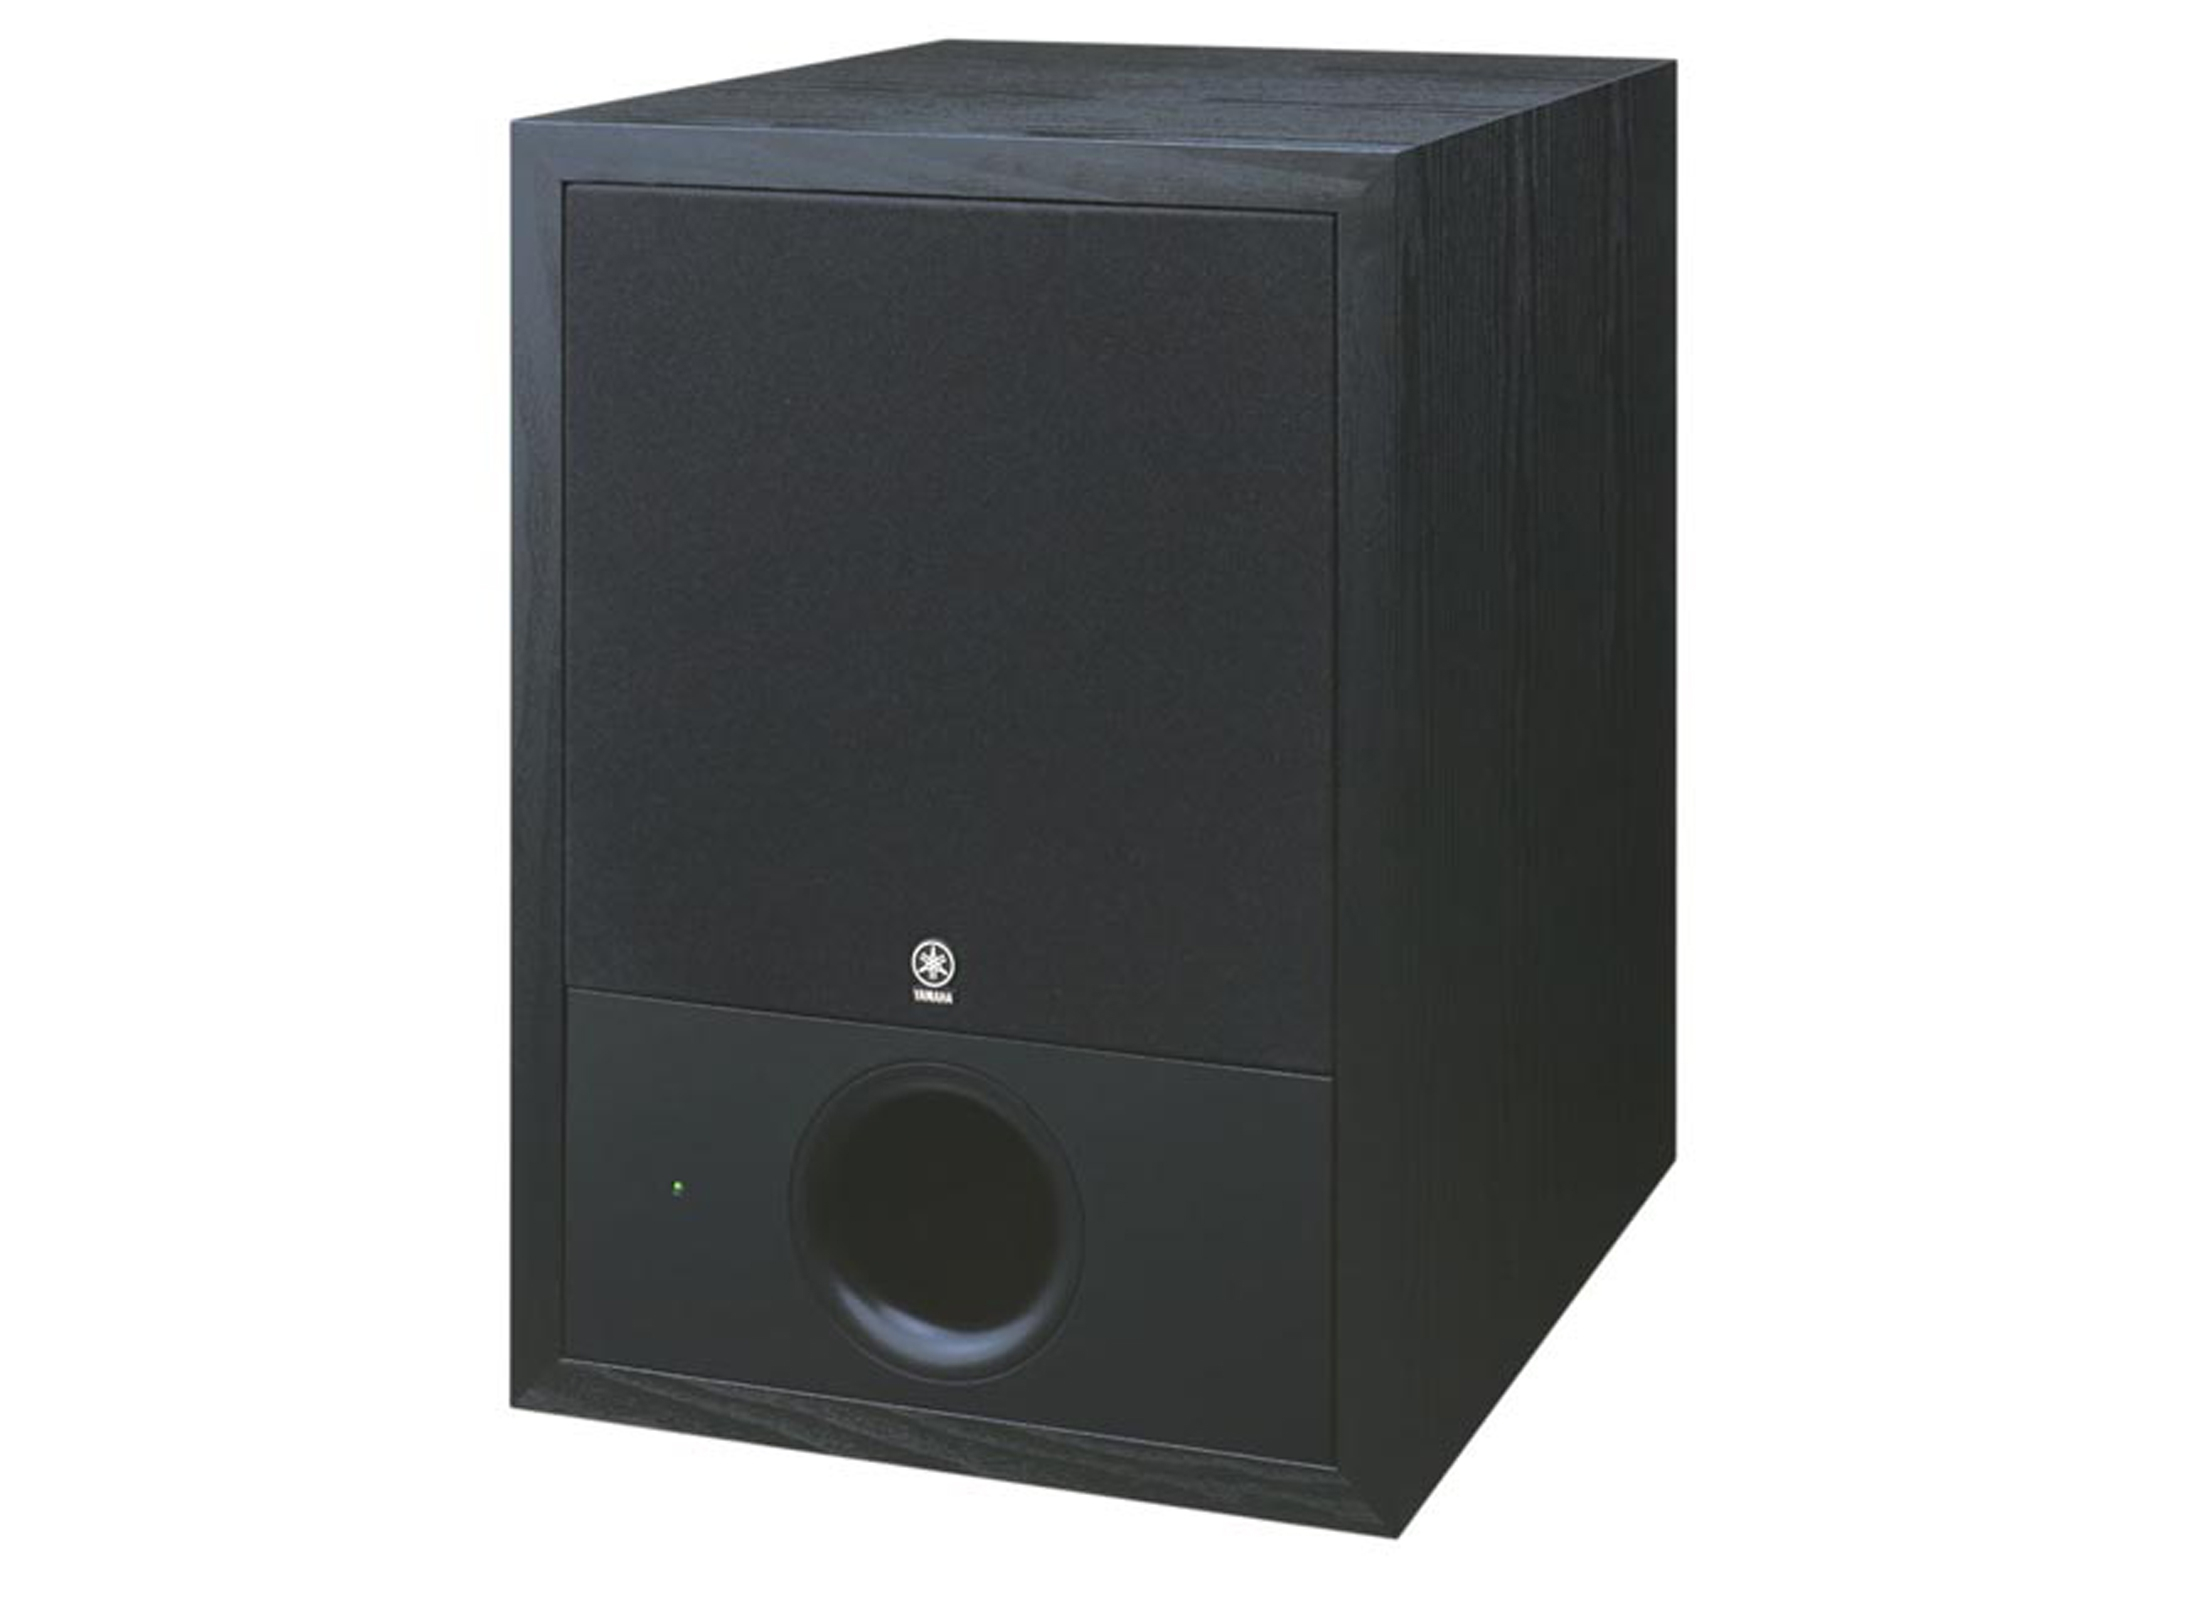 Yamaha Sw10 Active Studio Subwoofer Black At Huss Light Sound Hs5 Powered Monitor 1